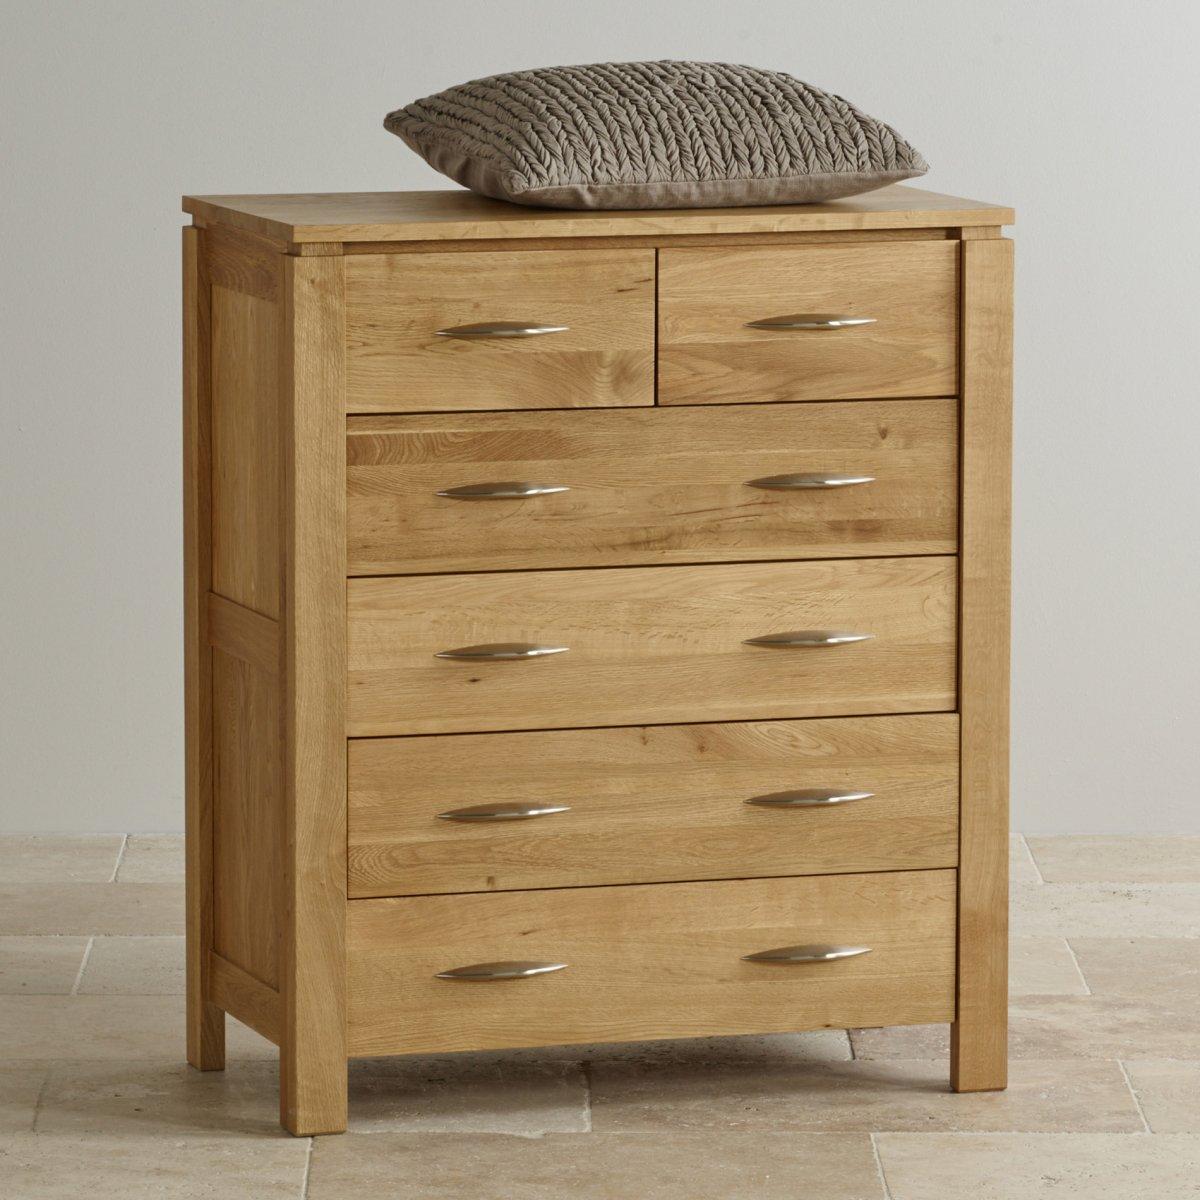 galway natural solid oak 4 2 chest of drawers. Black Bedroom Furniture Sets. Home Design Ideas